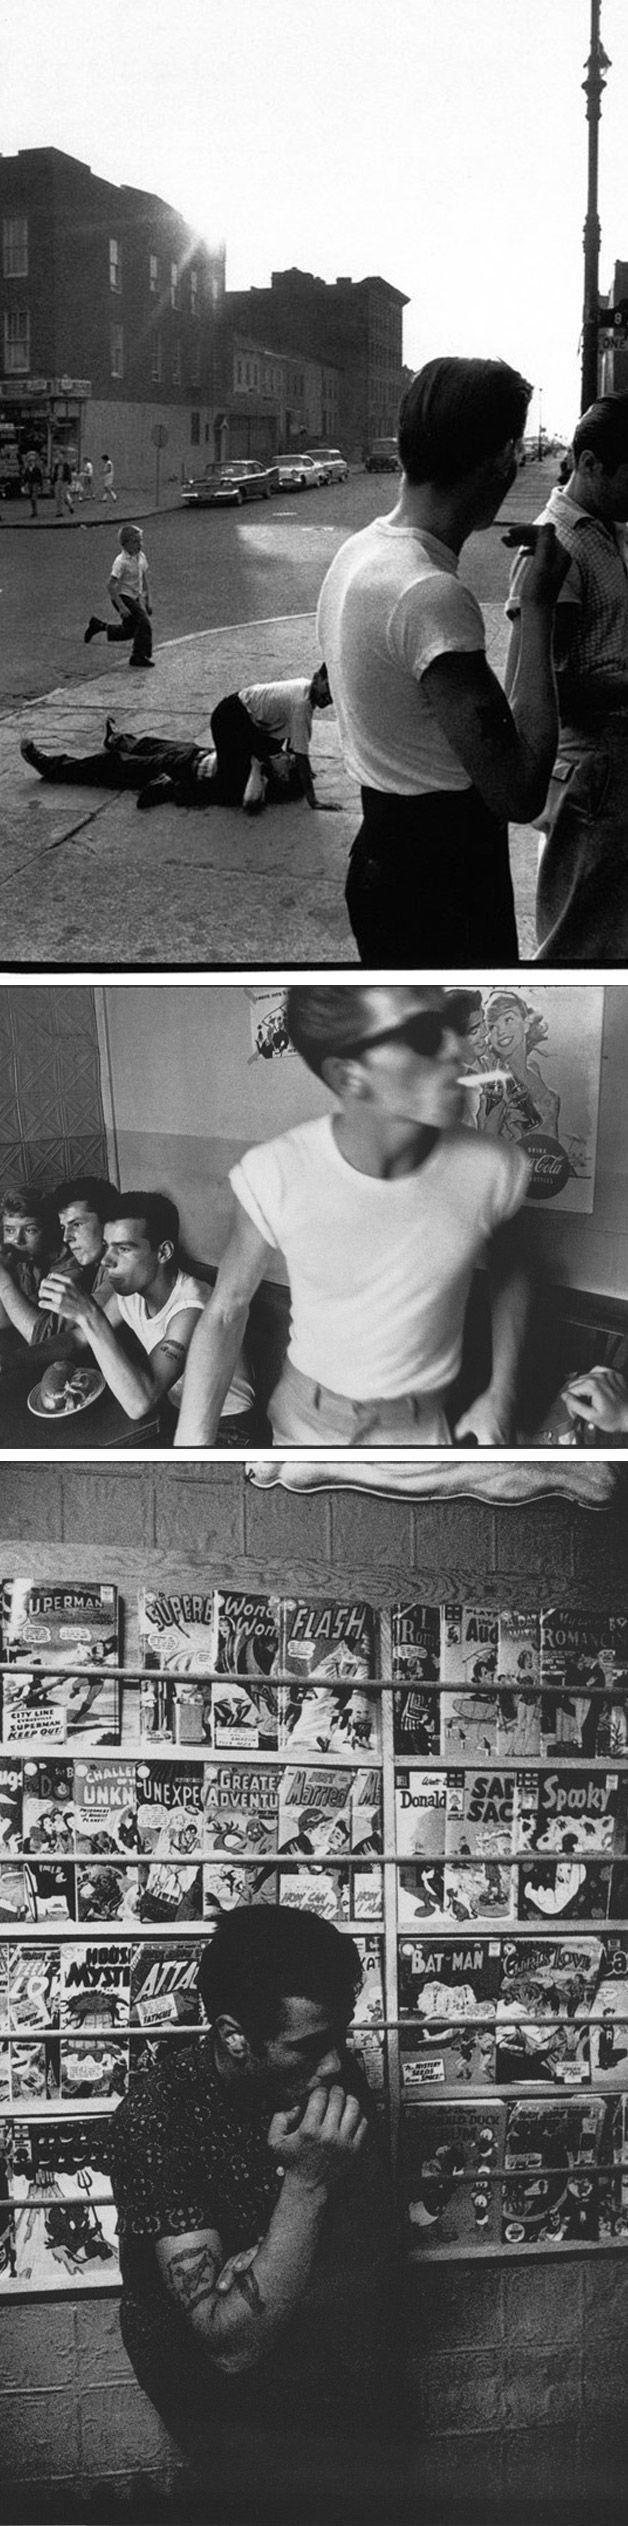 Jokers - 50's gang of NY - Photo by Bruce Davidson